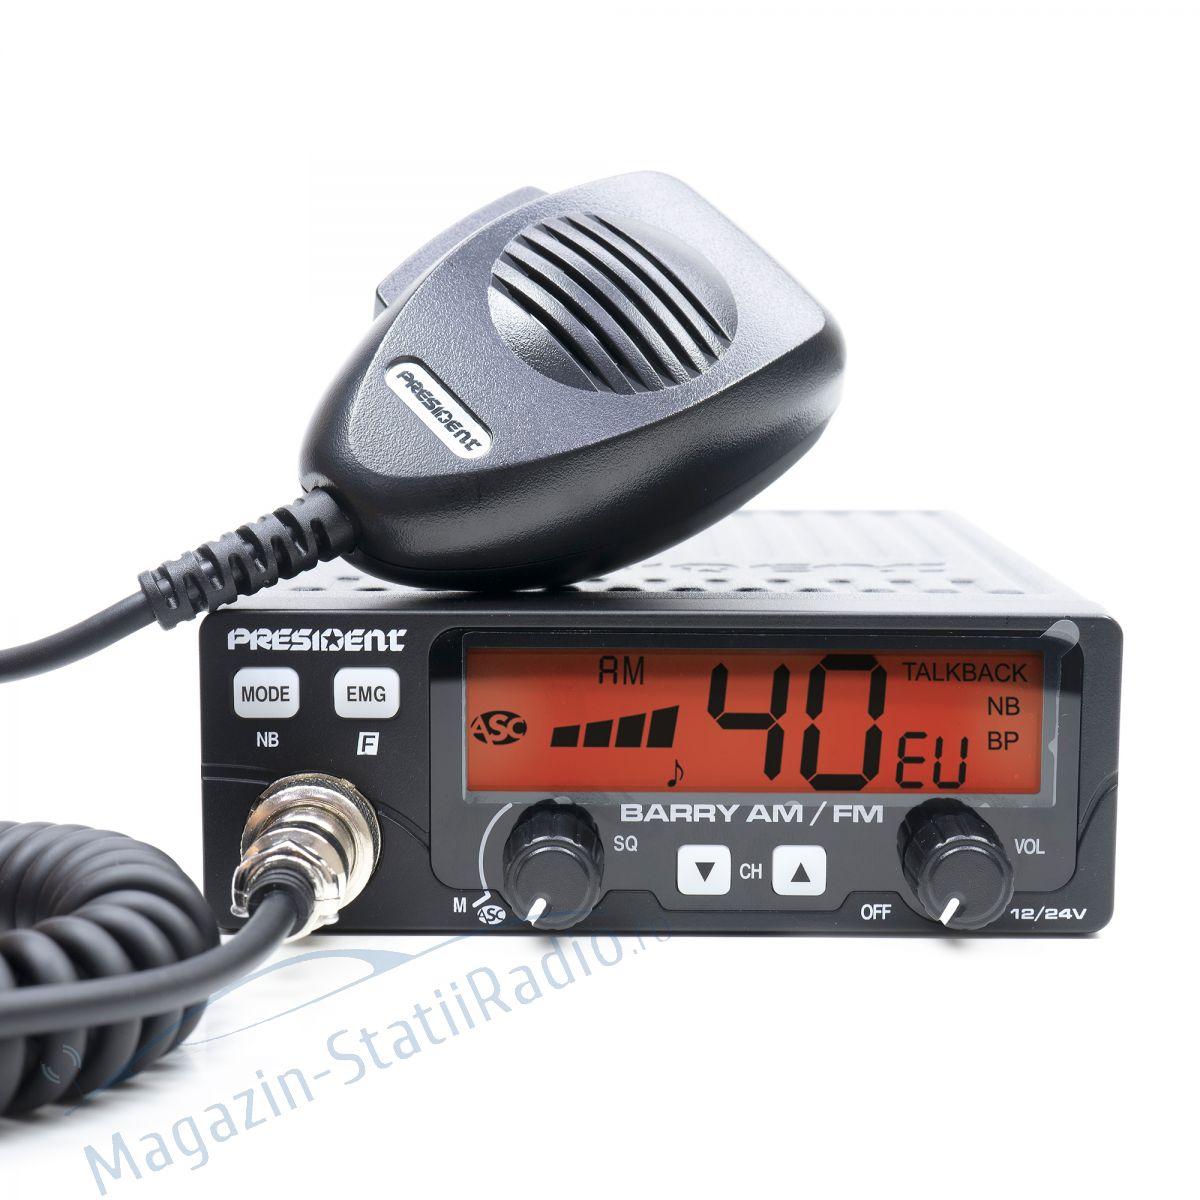 Statie Radio CB President BARRY AM/FM ASC, filtre Murata, 12/24v